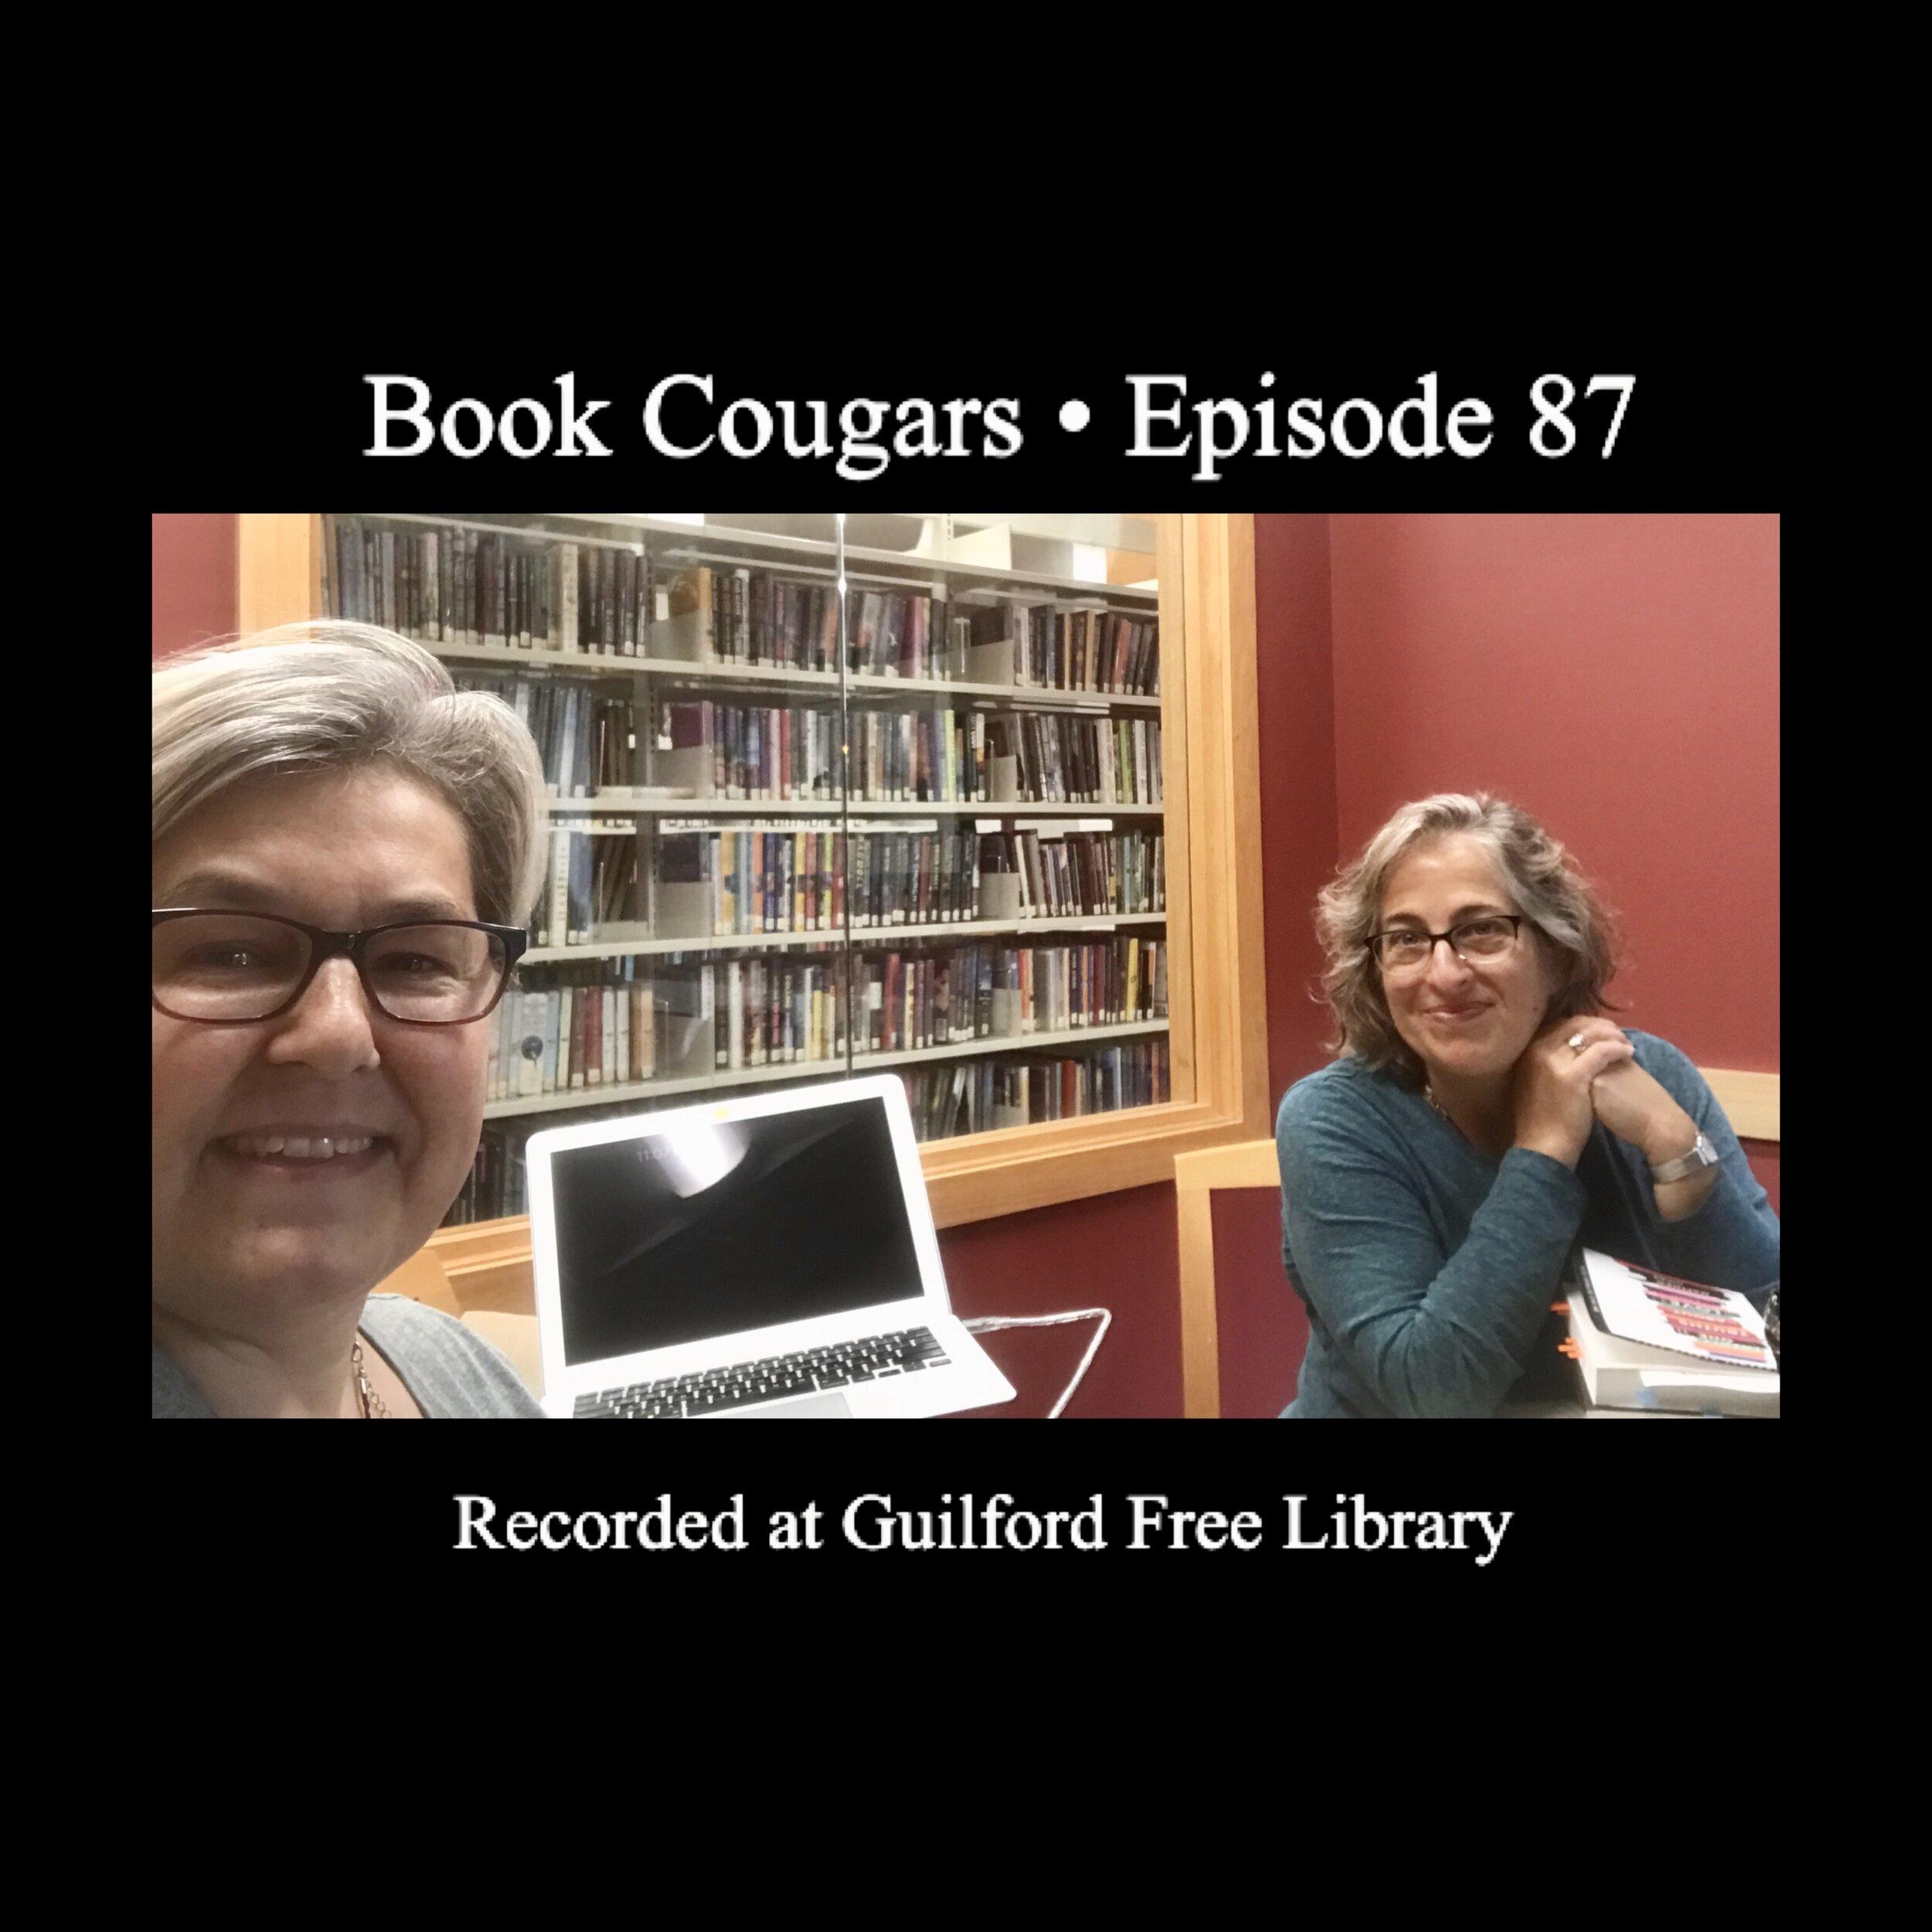 Book Cougars - Episode 87.jpeg